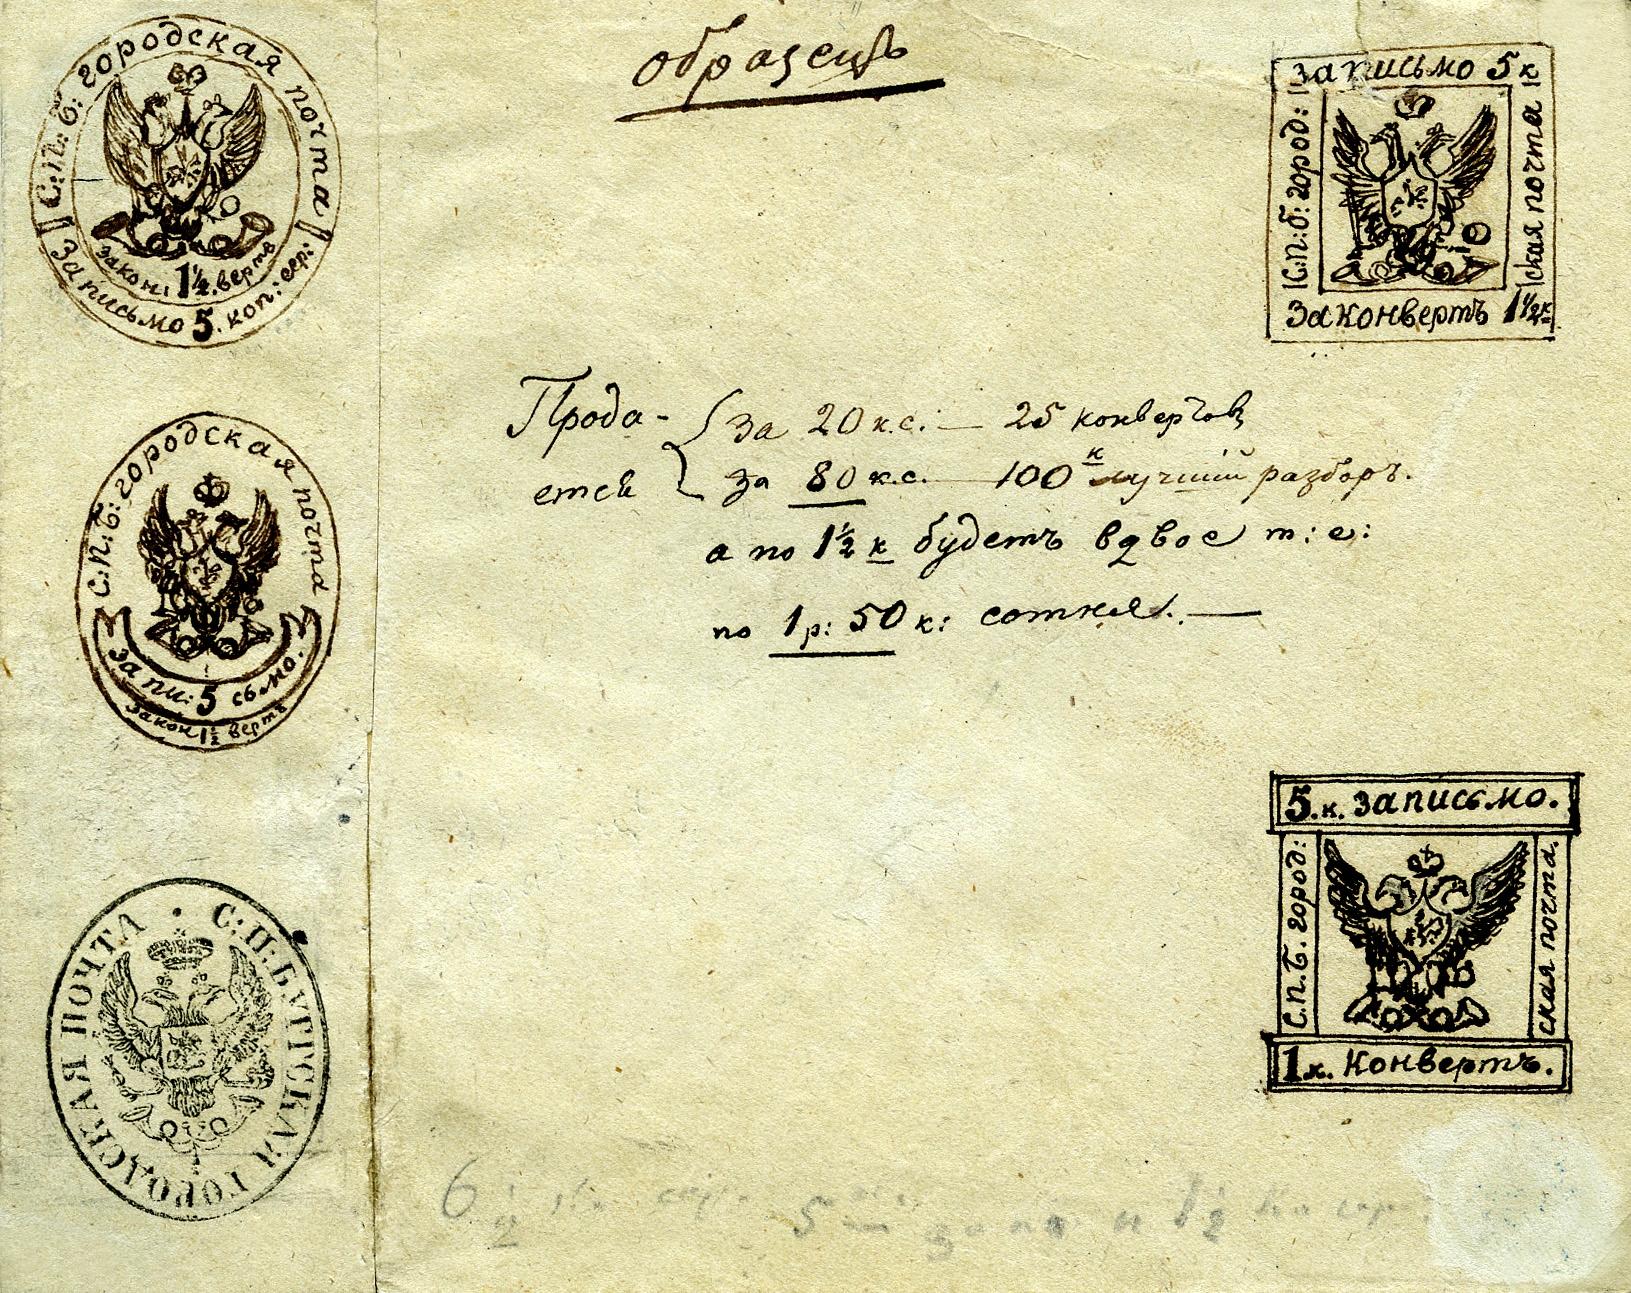 Heraldic drawings on envelope (Courtesy of Smithsonian National Postal Museum)